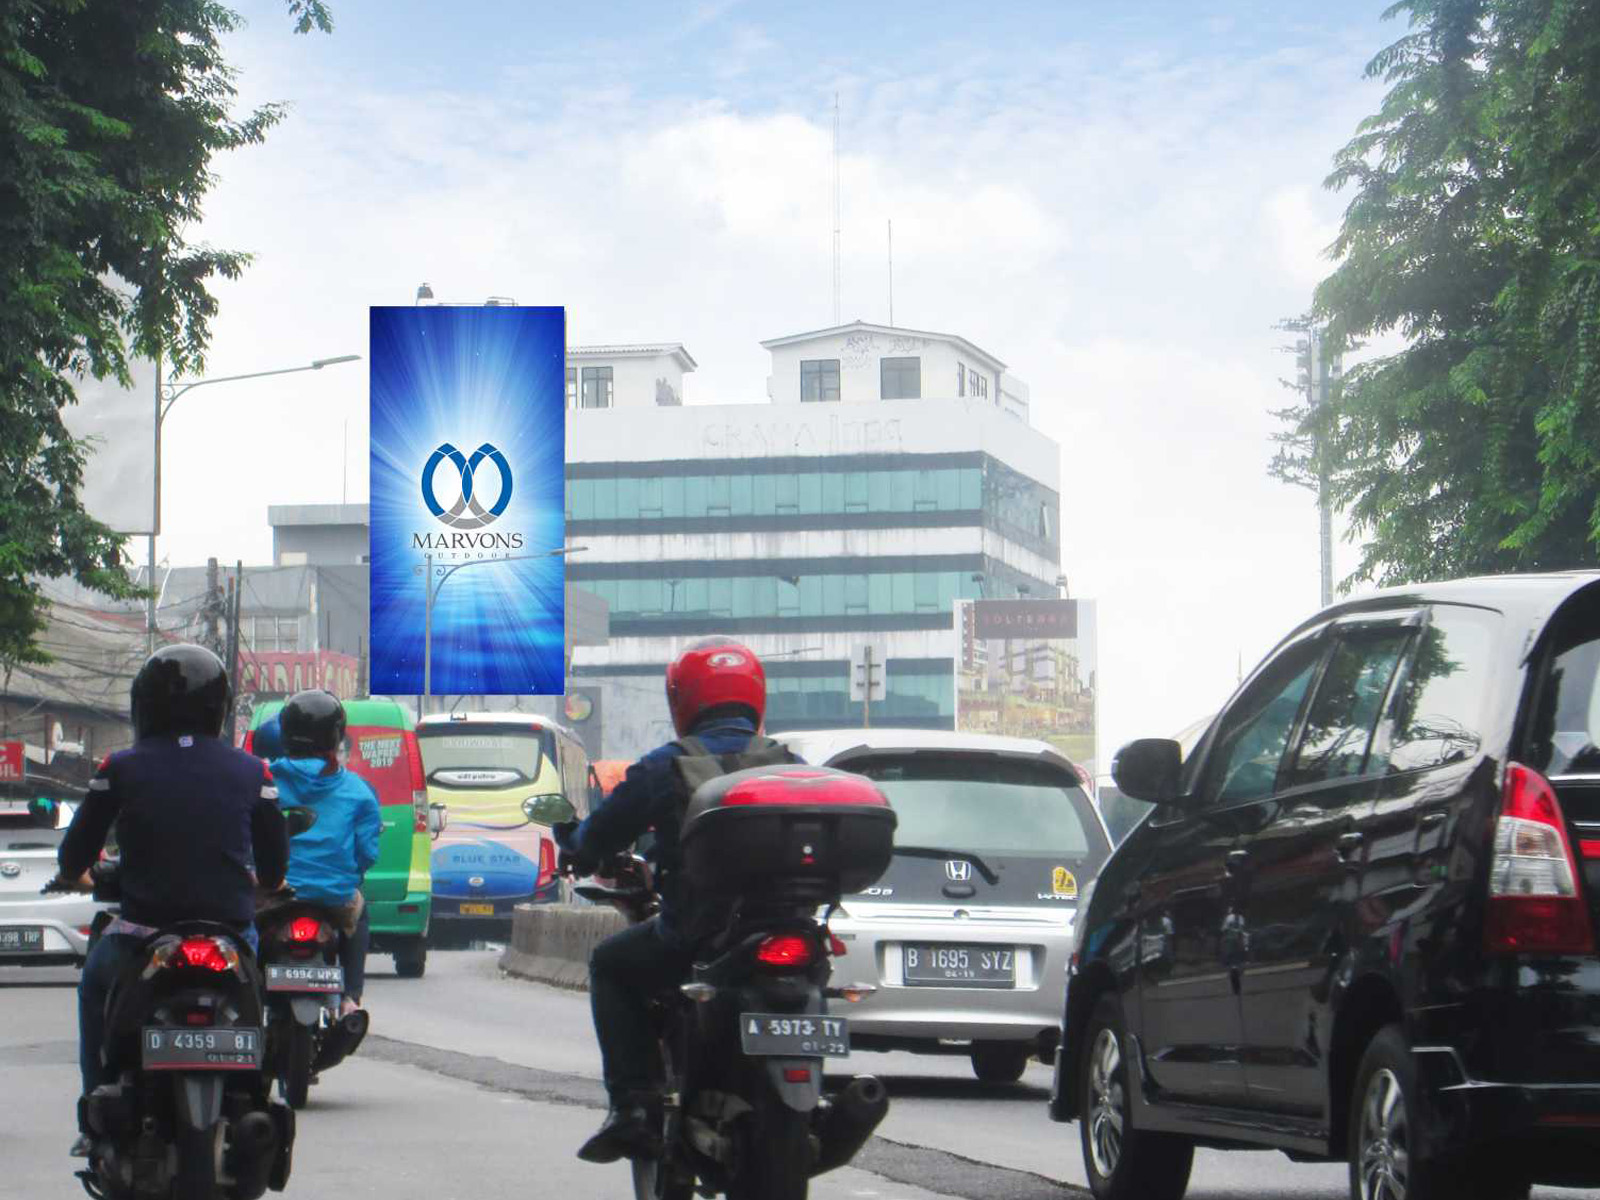 PT. Marvons Media Utama - Buncit Dunlop (MV 012) - 5 m x 10 m x 2 mk Vertikal